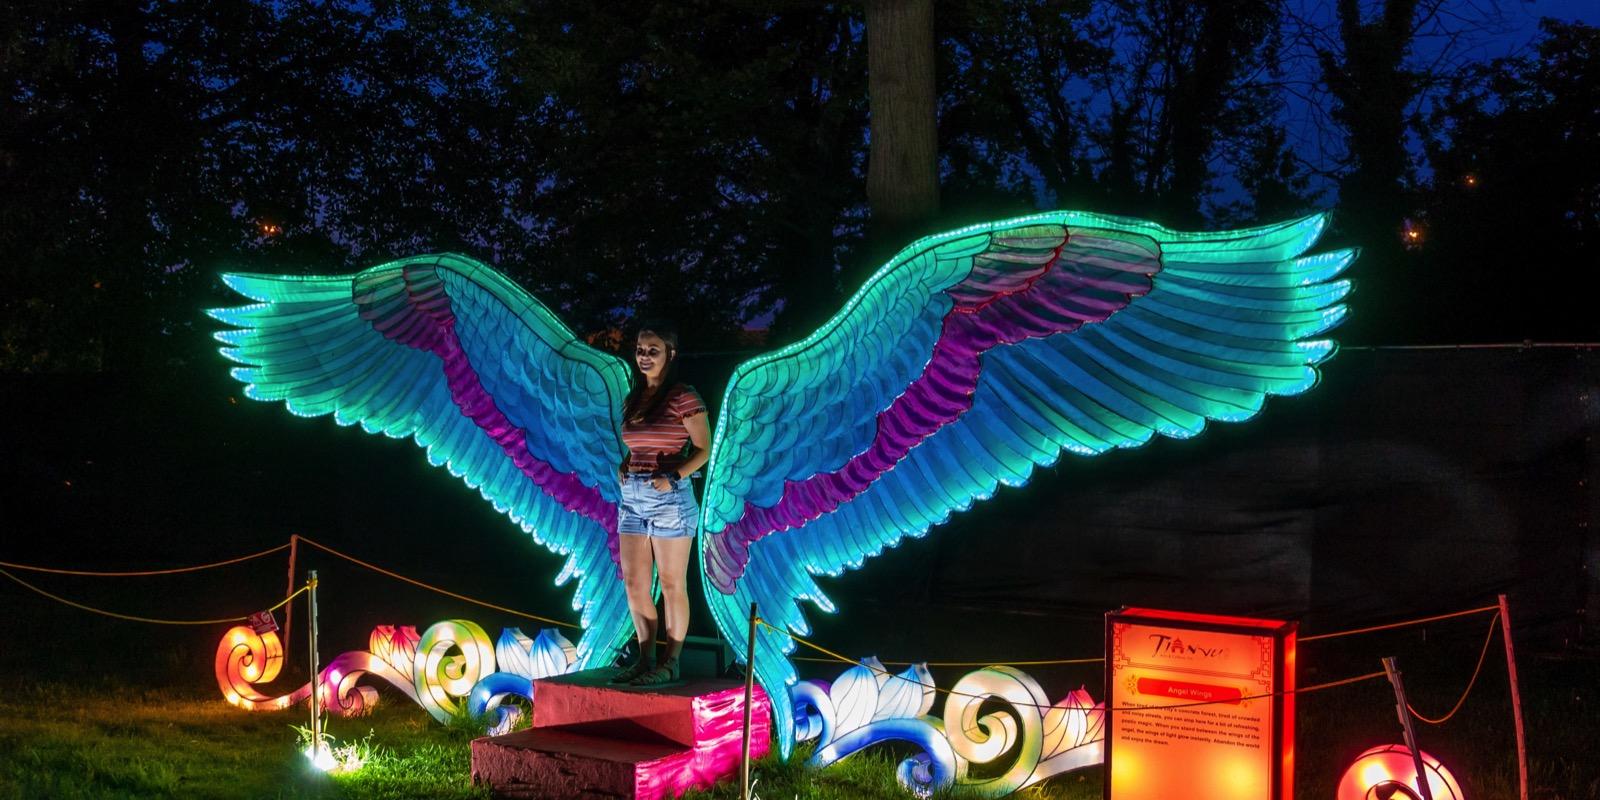 Moonlight Forest – Lantern Art Festival at the Los Angeles